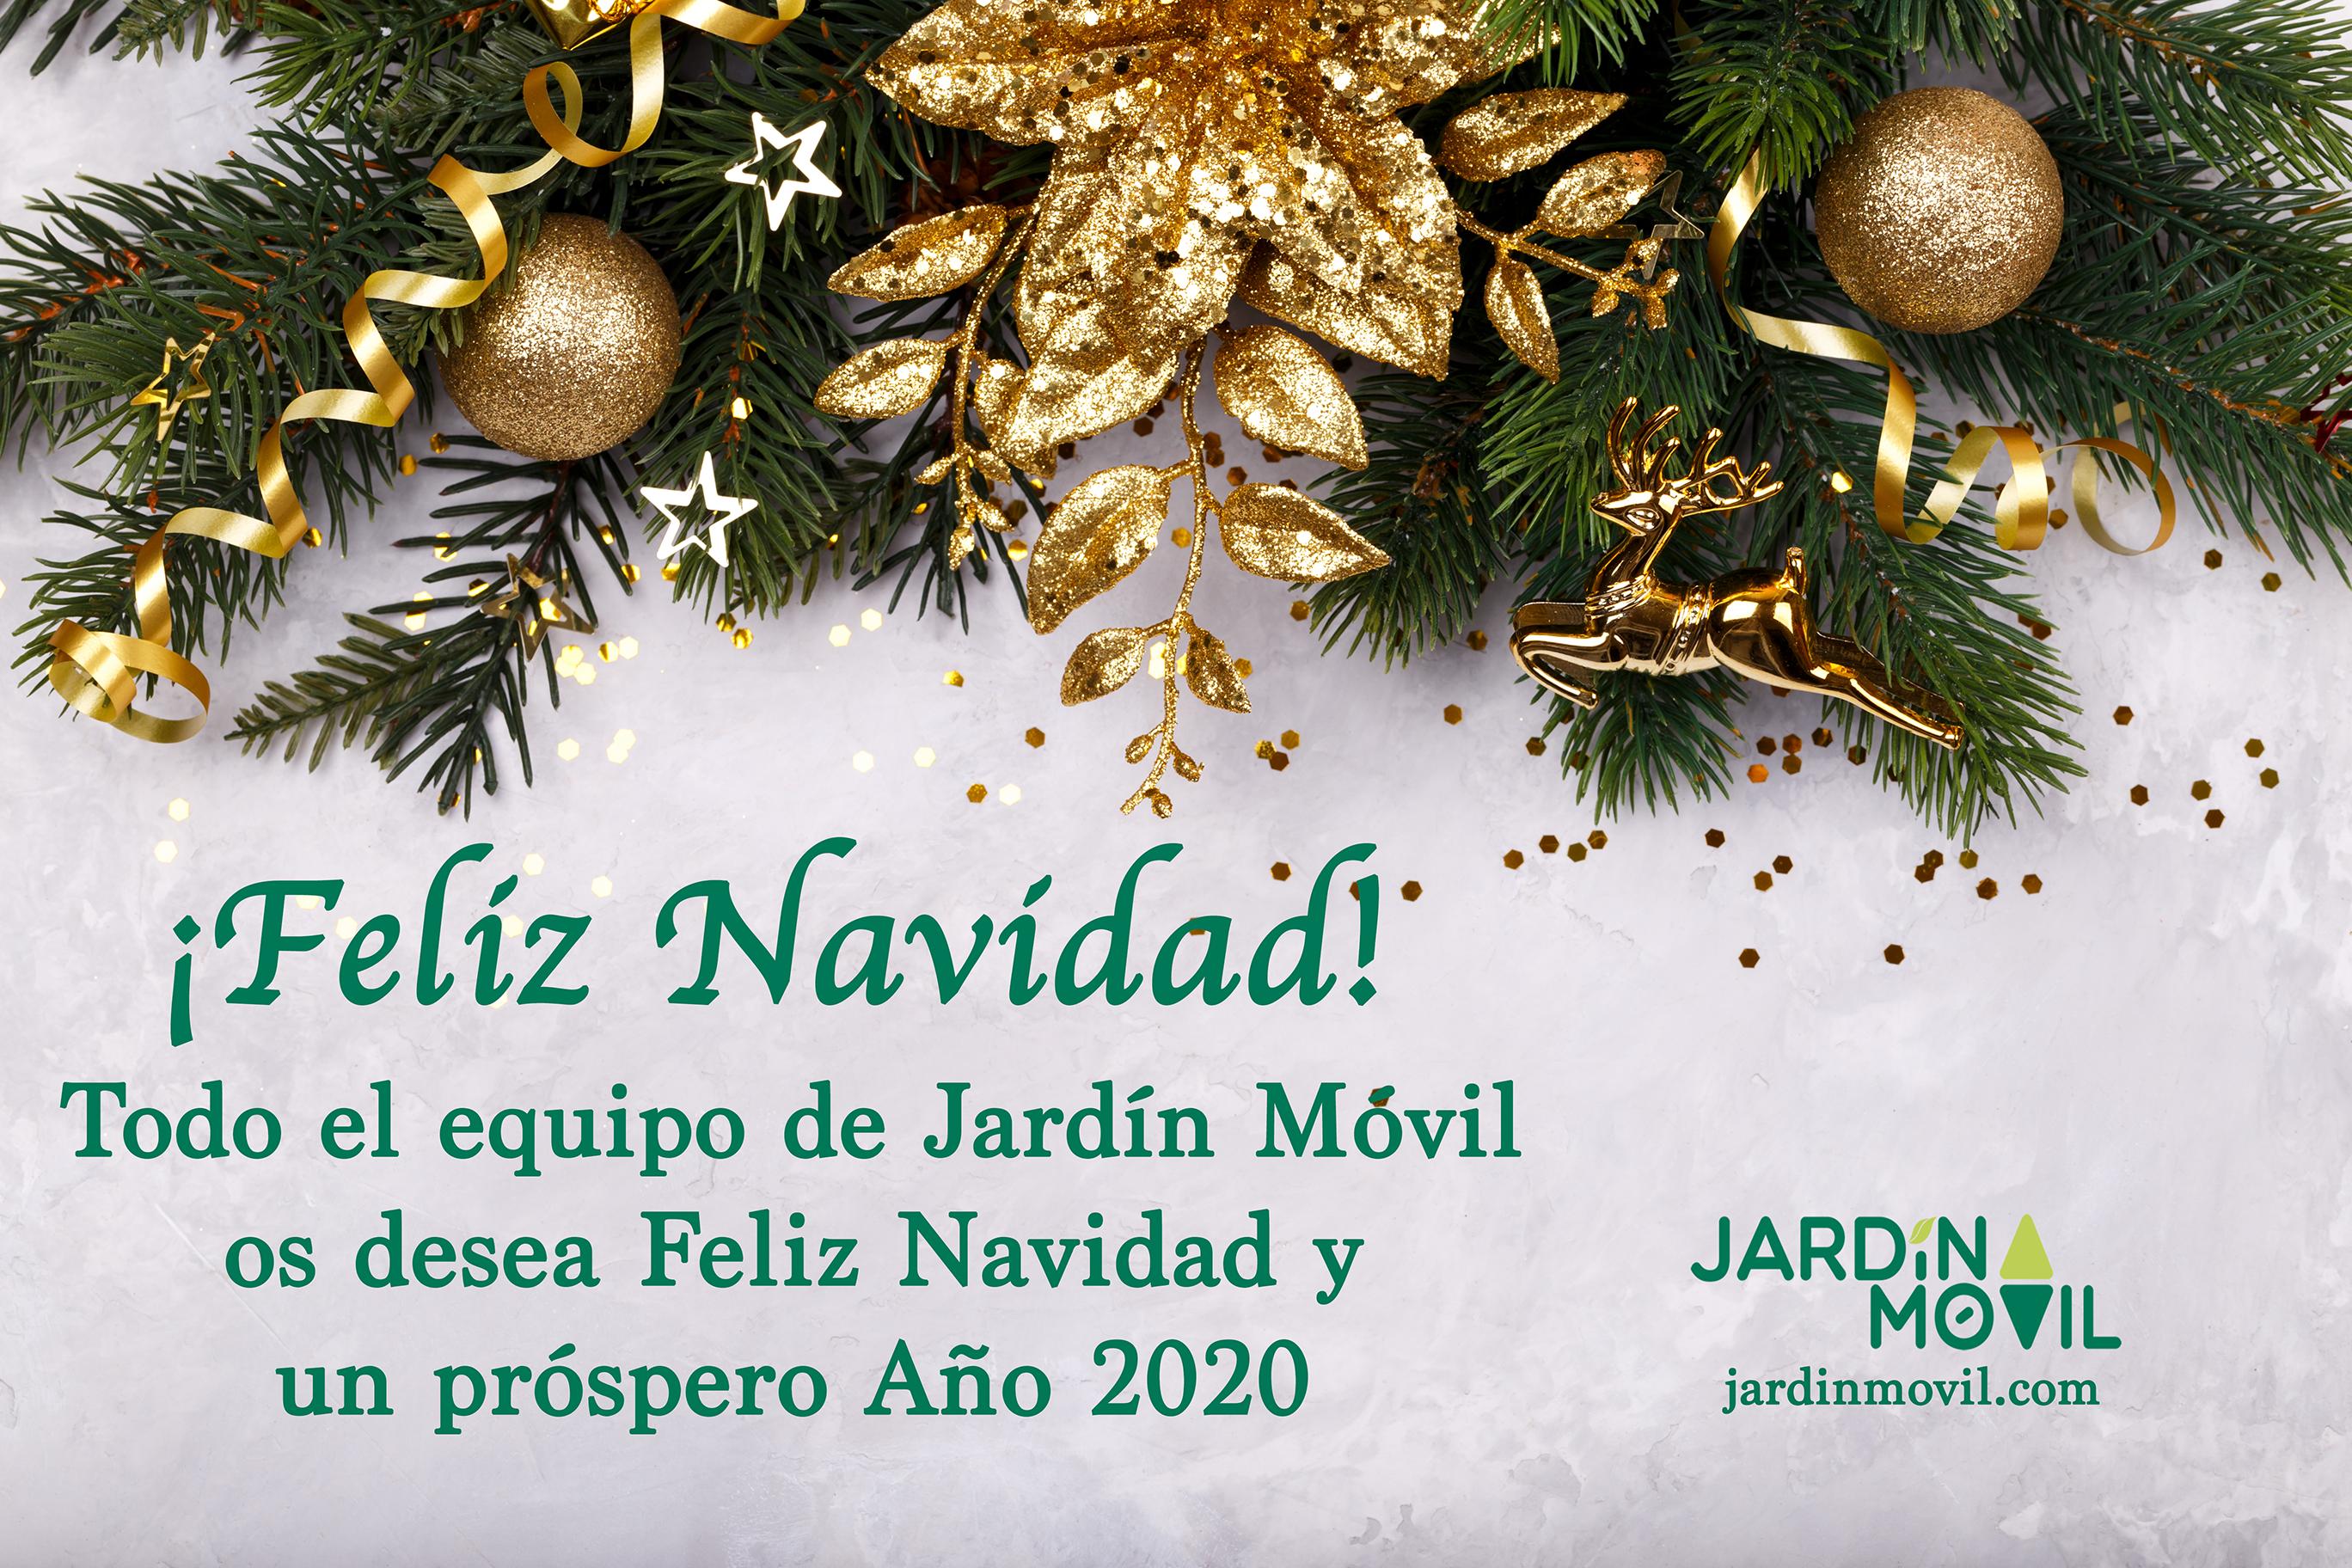 Jardín Móvil® les desea Feliz Navidad